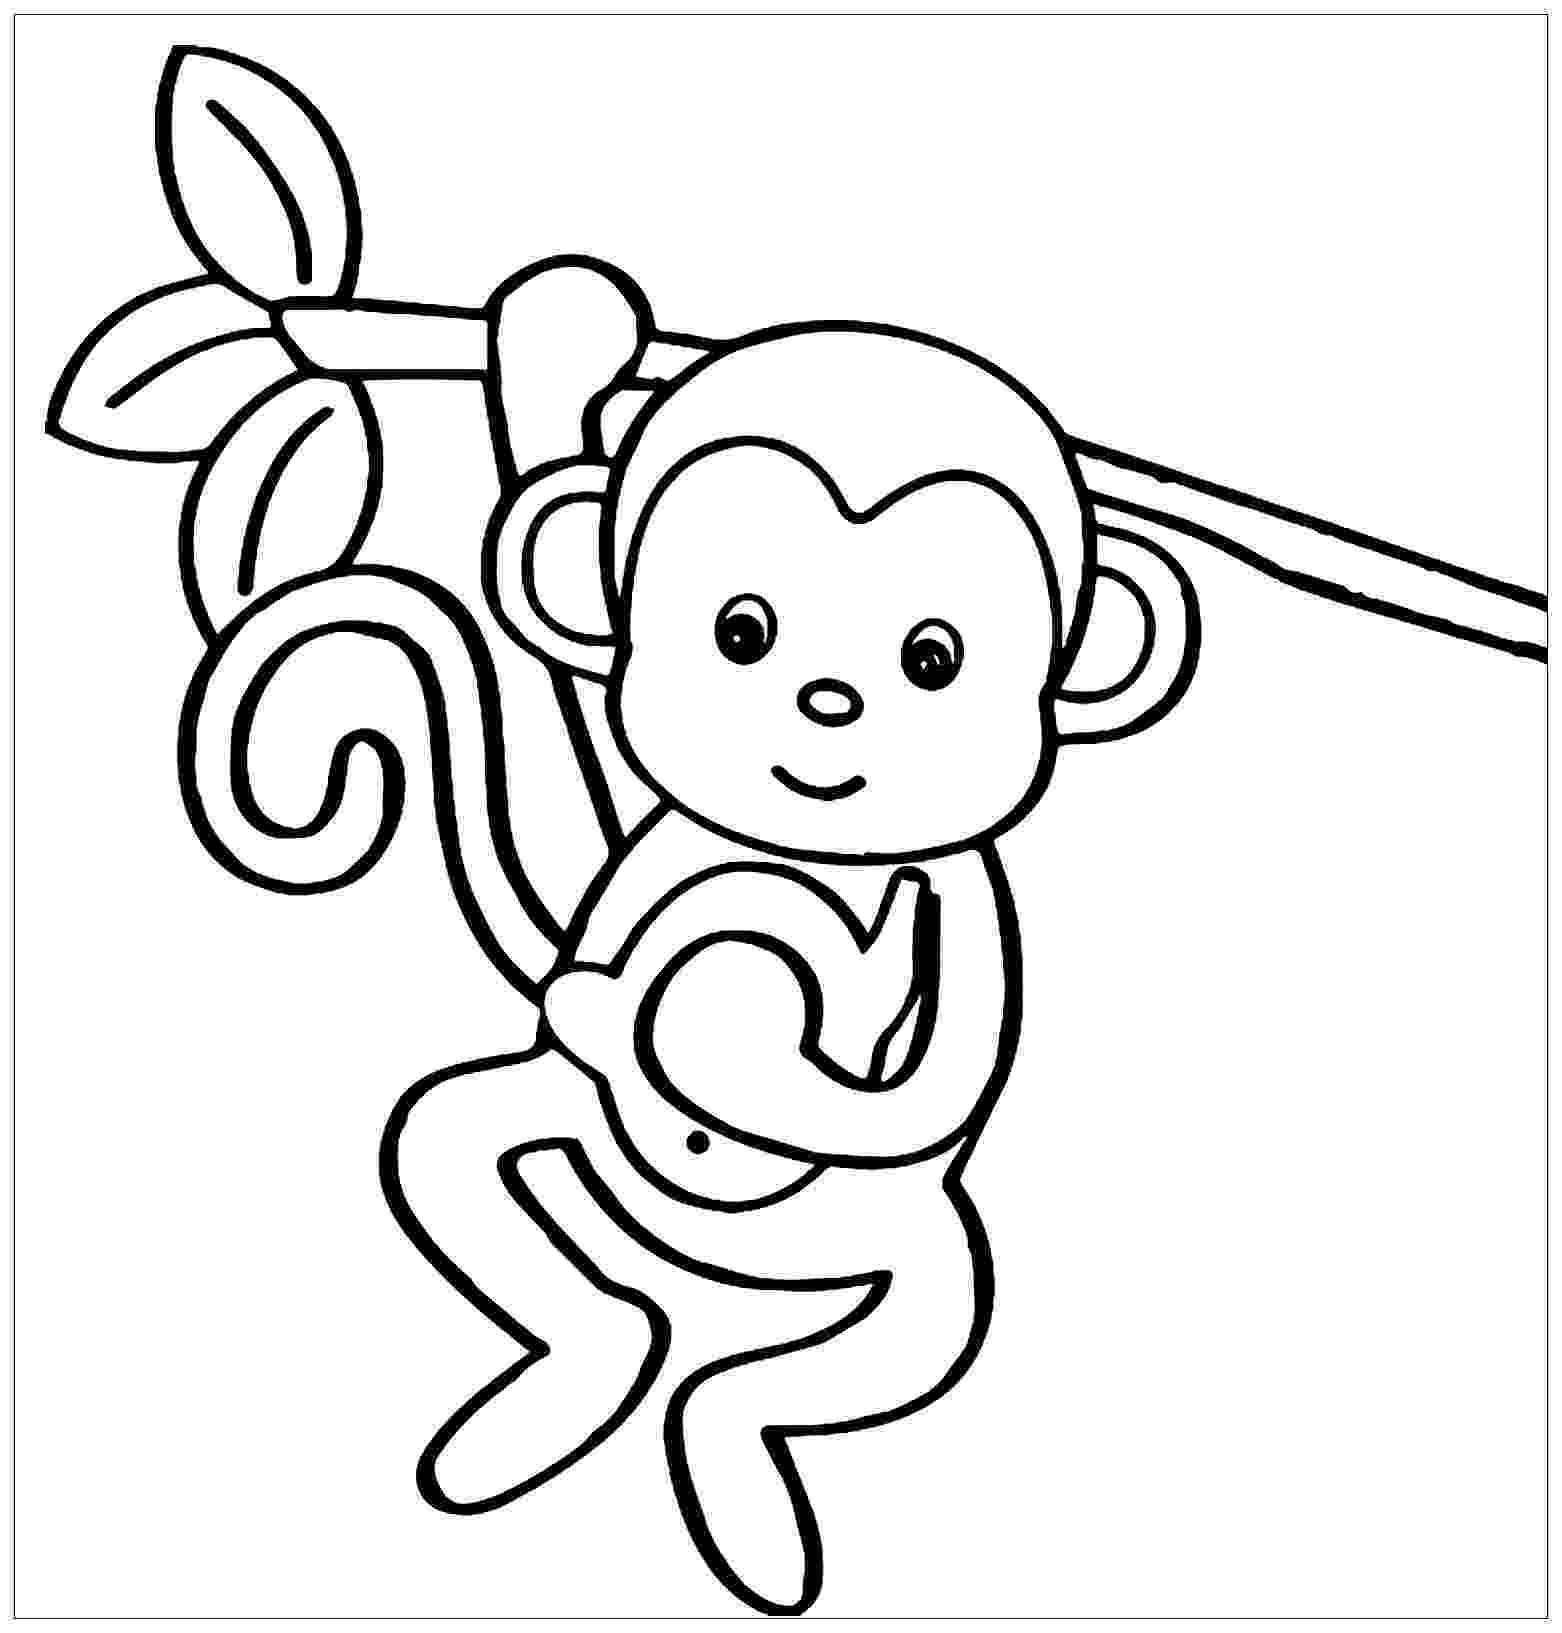 monkey color pages monkey cars judo colouring pages qaf quotقquot kerd monkeyقرد color monkey pages